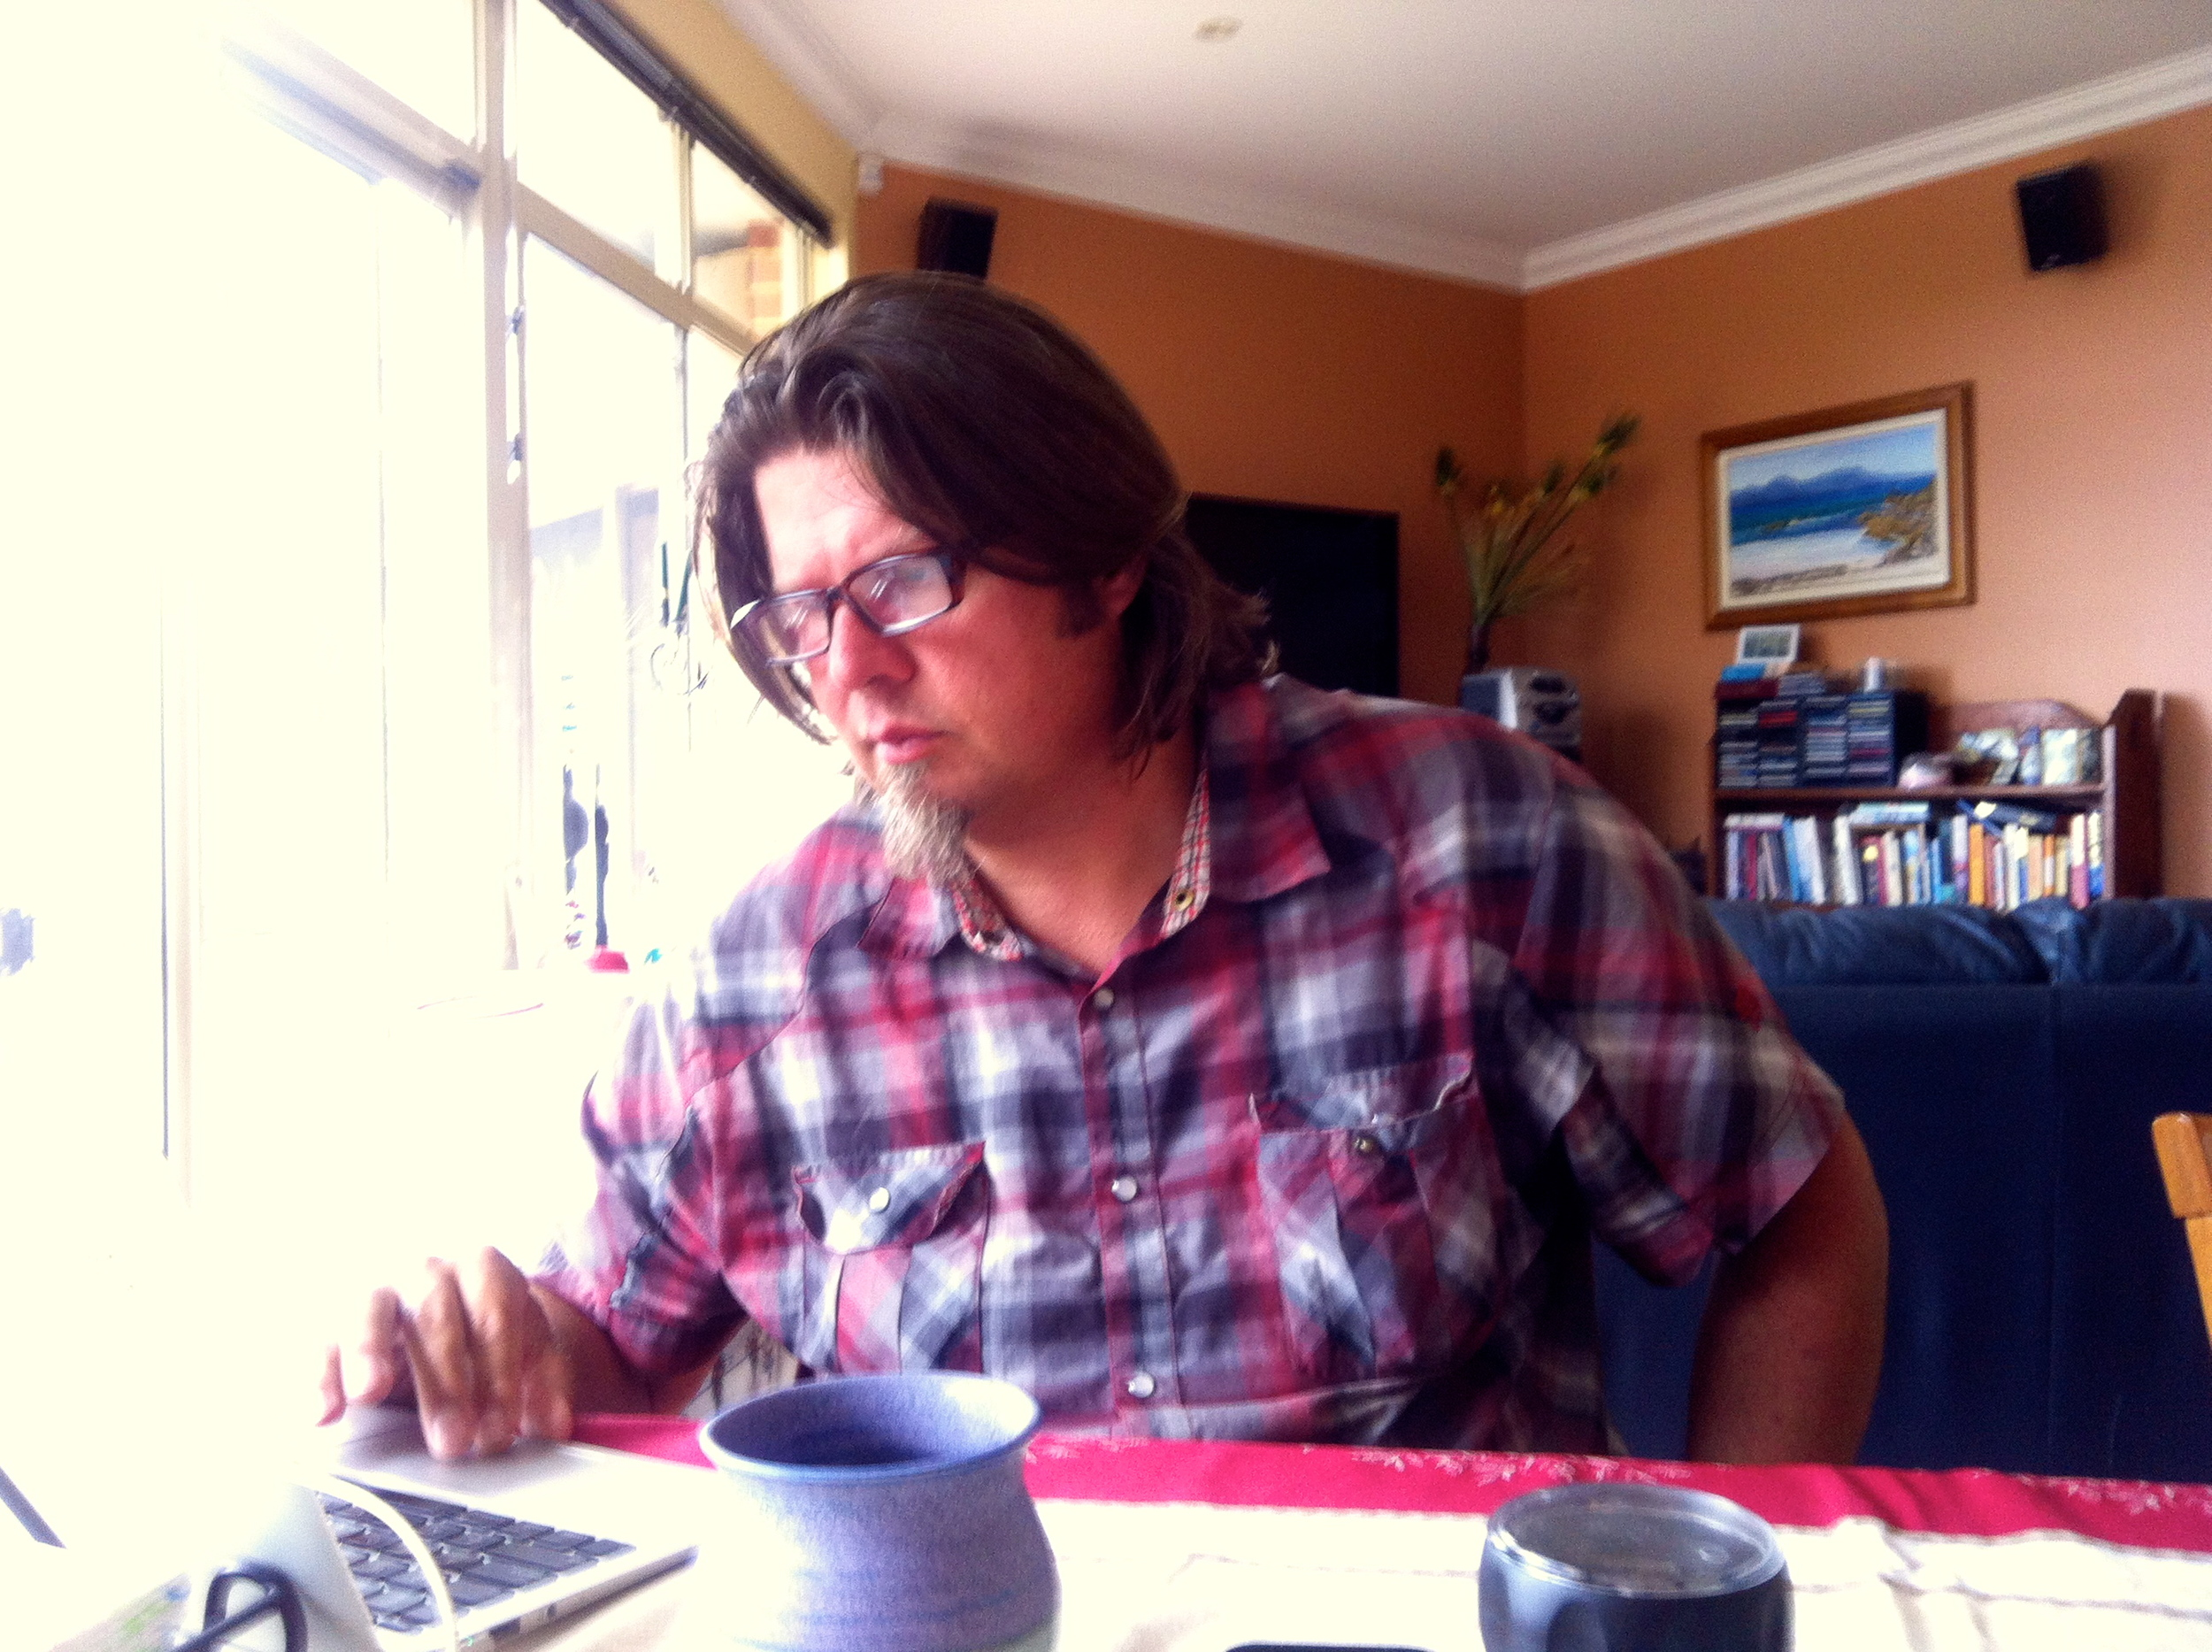 Kev researching his BMW bike parts.